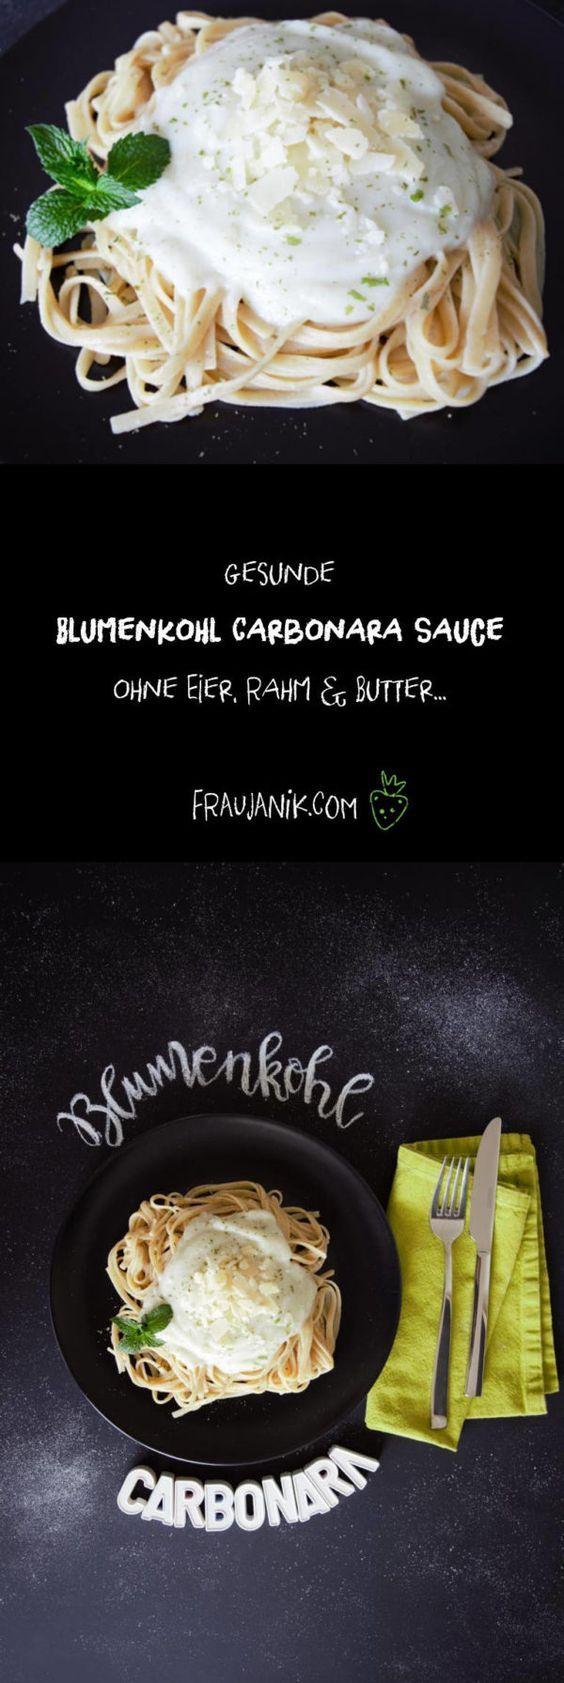 Bumenkohl Carbonara Sauce